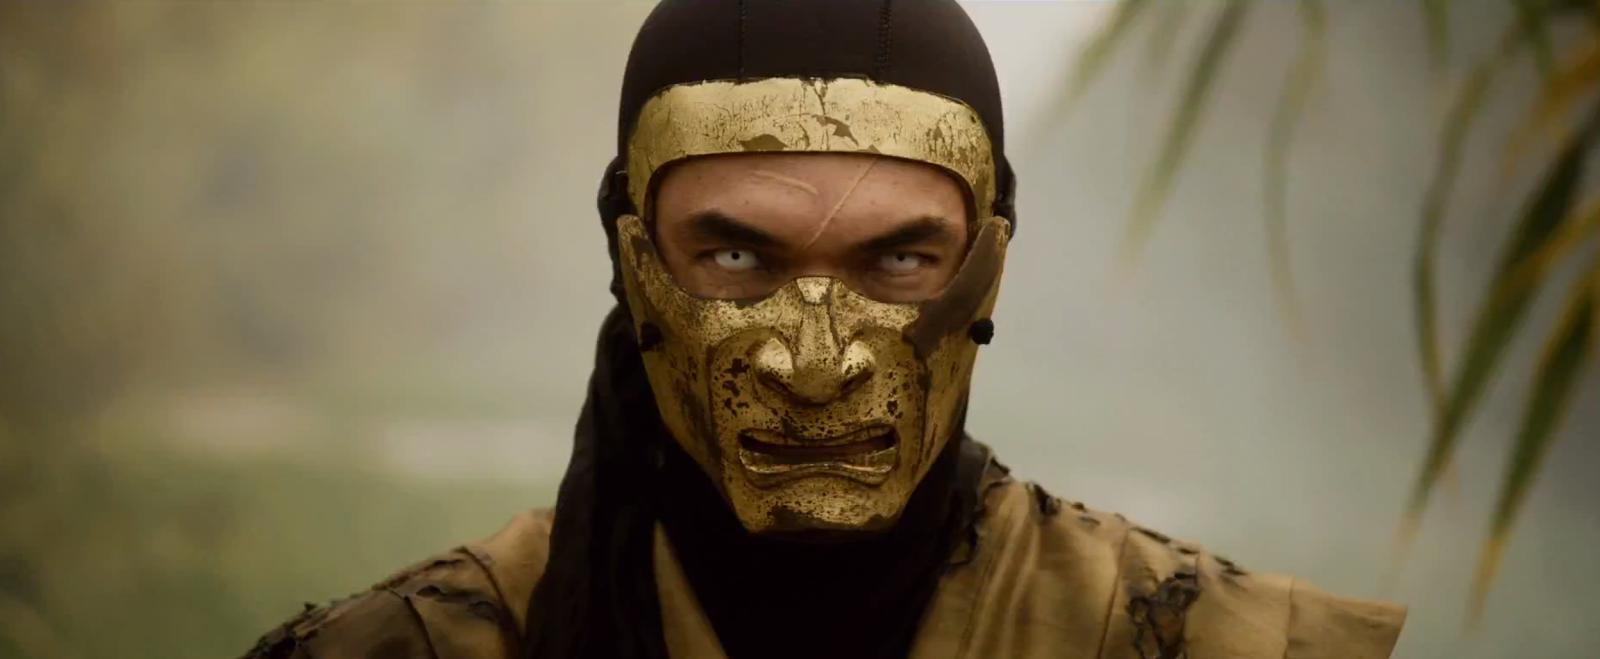 Mortal Kombat Legacy Sub Zero Costume Prime Props: August 20...